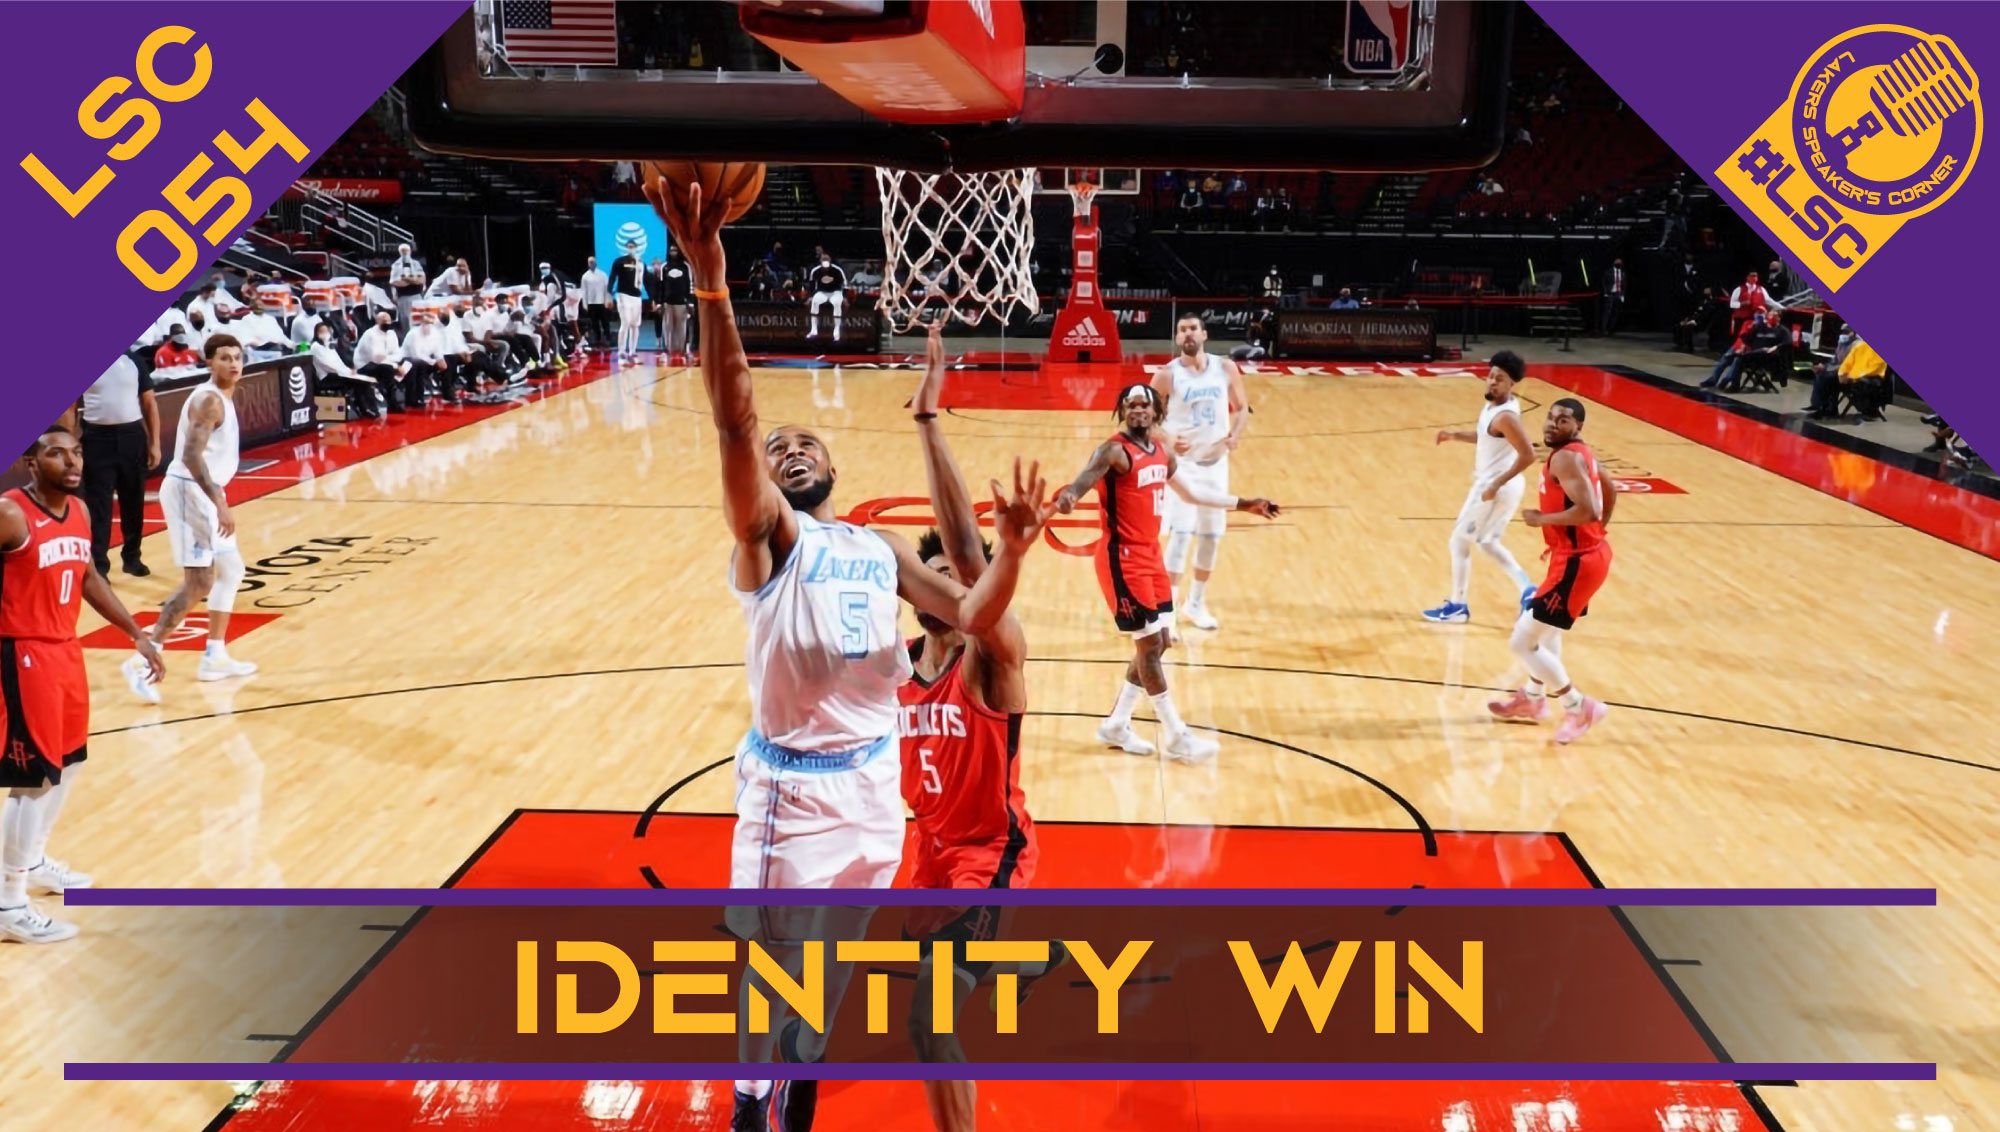 Identity Win